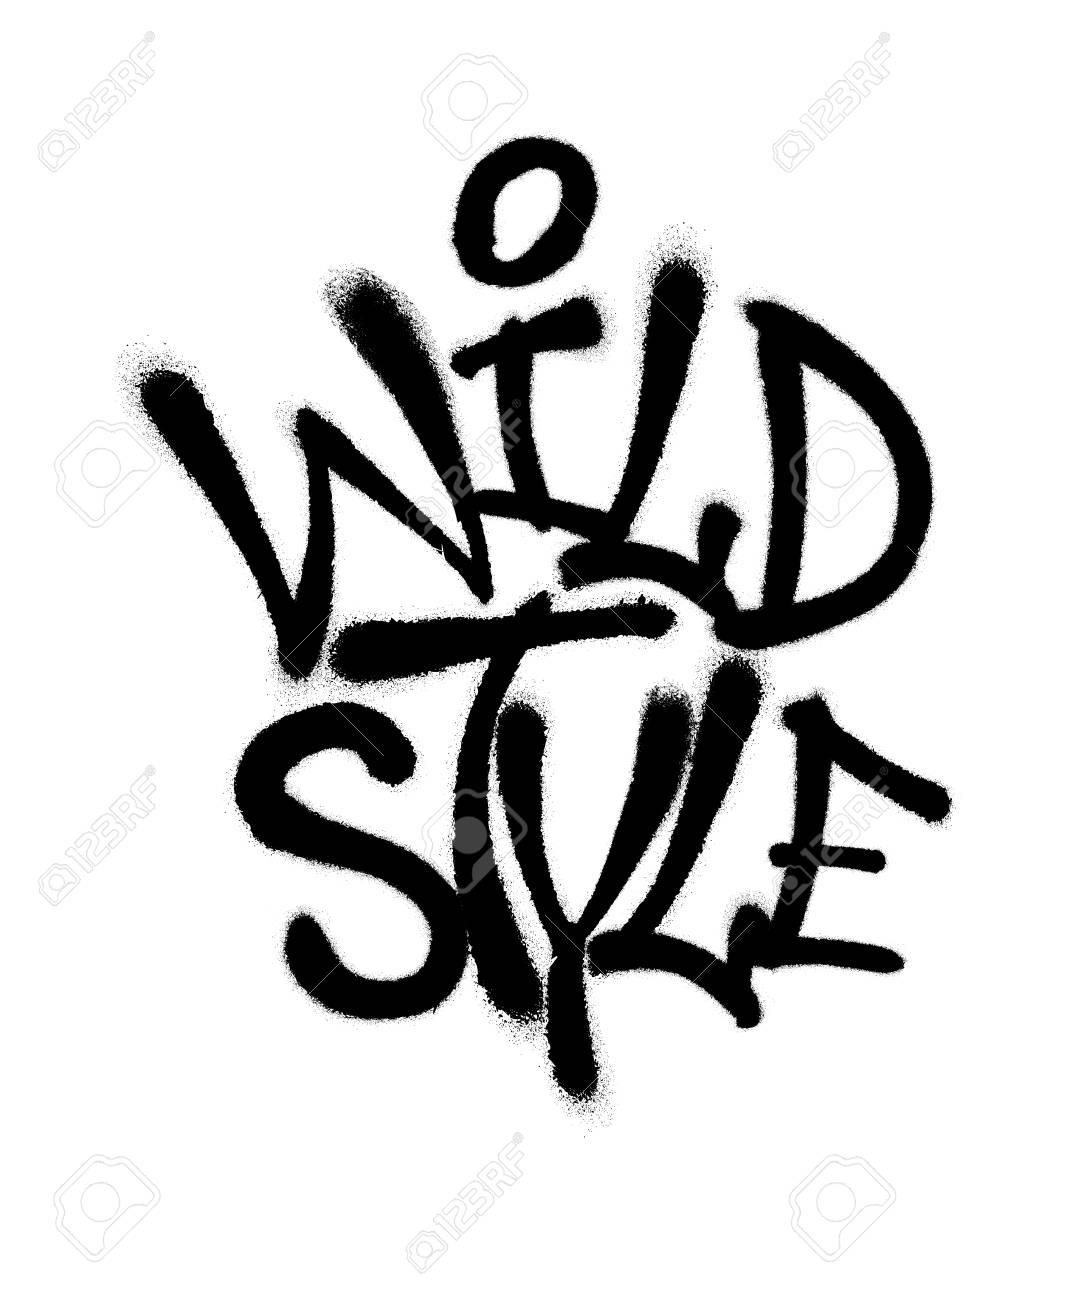 Sprayed wild style font graffiti with overspray in black over white vector graffiti art illustration